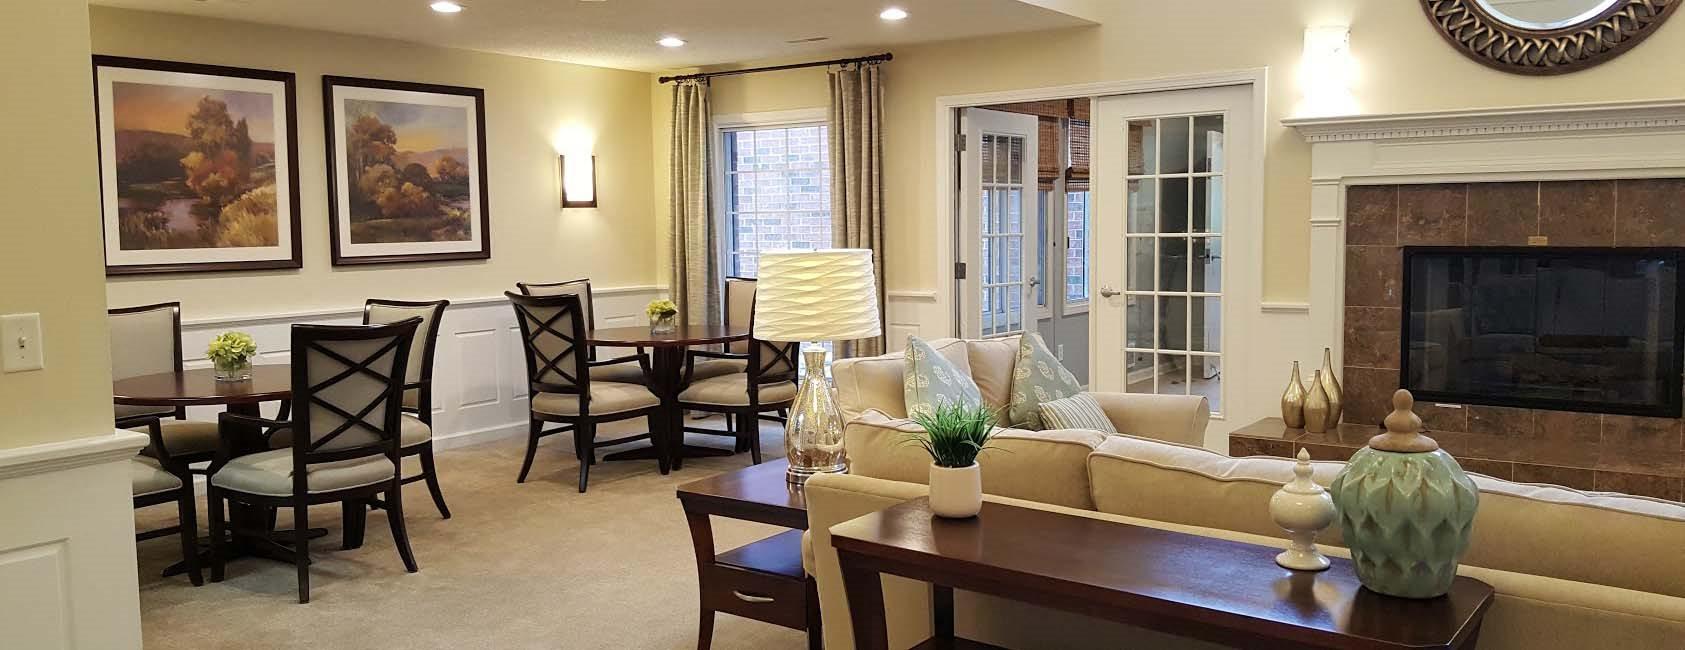 Wonderful Furnished Community at Brookfield Highlands Apartments 55+, 20825 George Hunt Circle, Waukesha, WI 53186